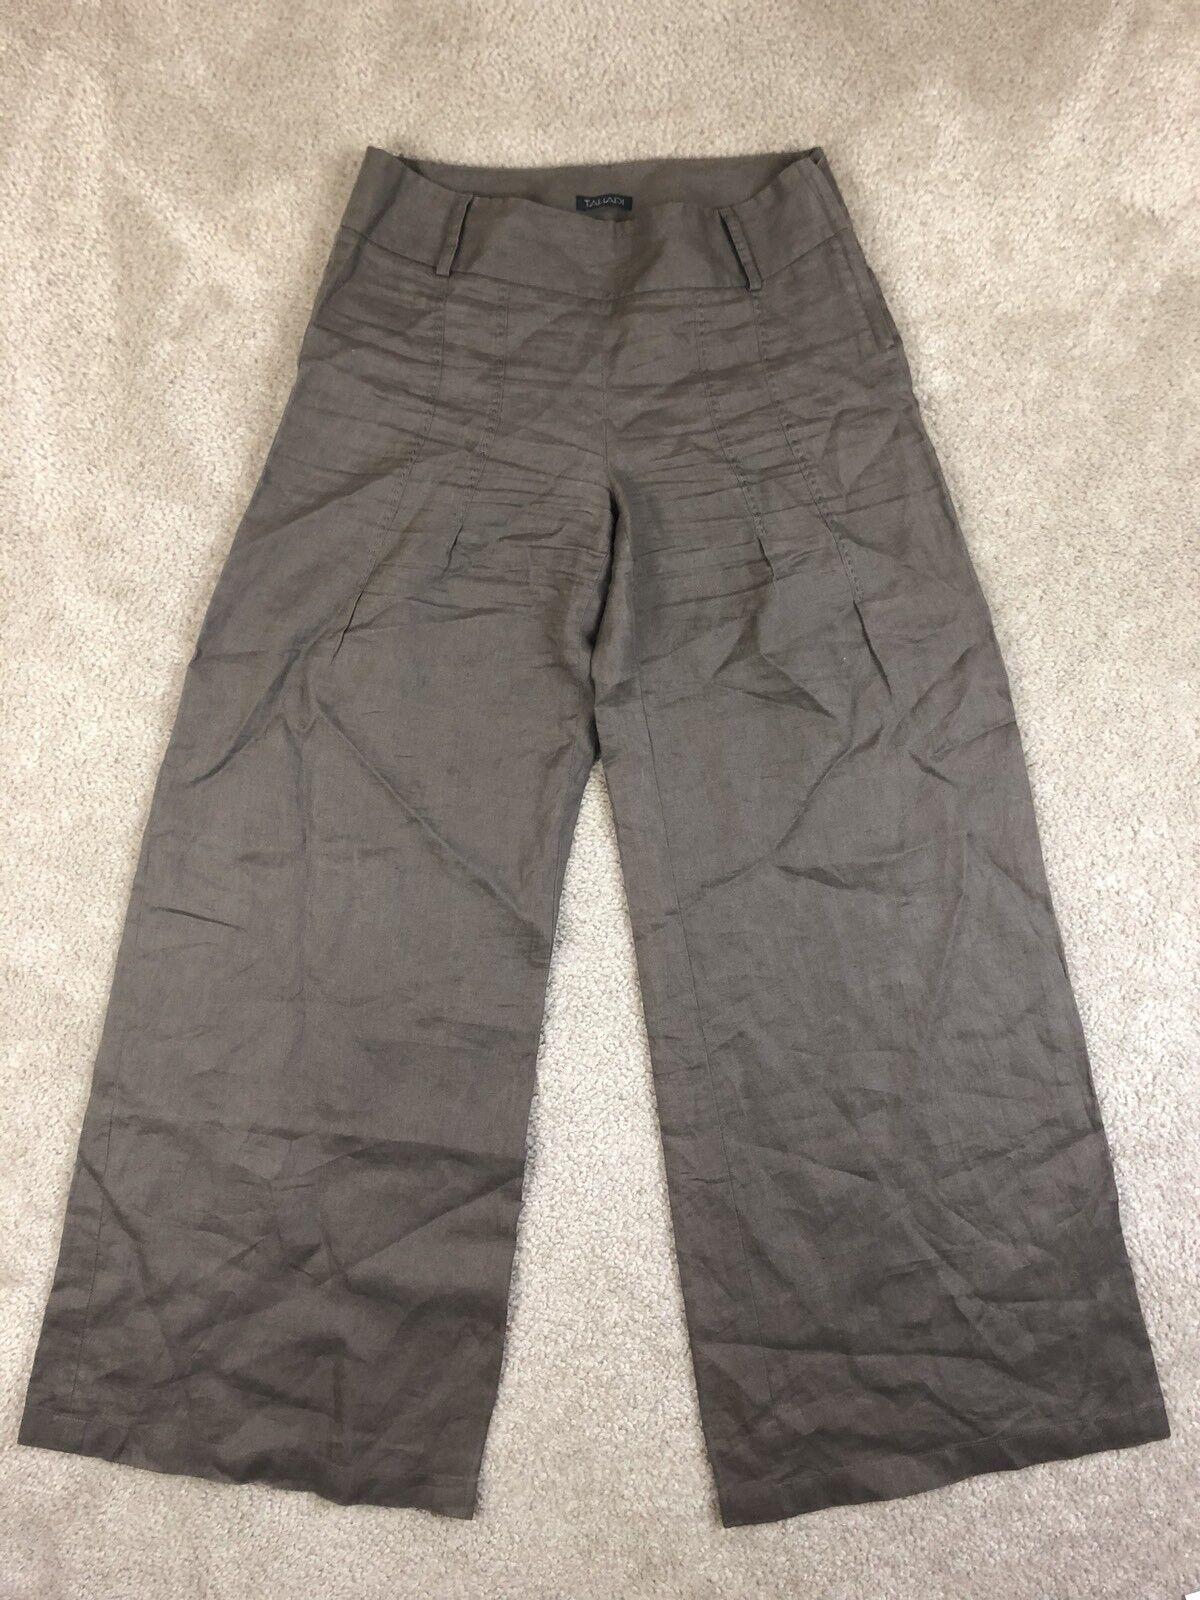 Tahari Pants Size 6 Brown 100% Linen Stitch Detail Flare Wide Leg Side Zip